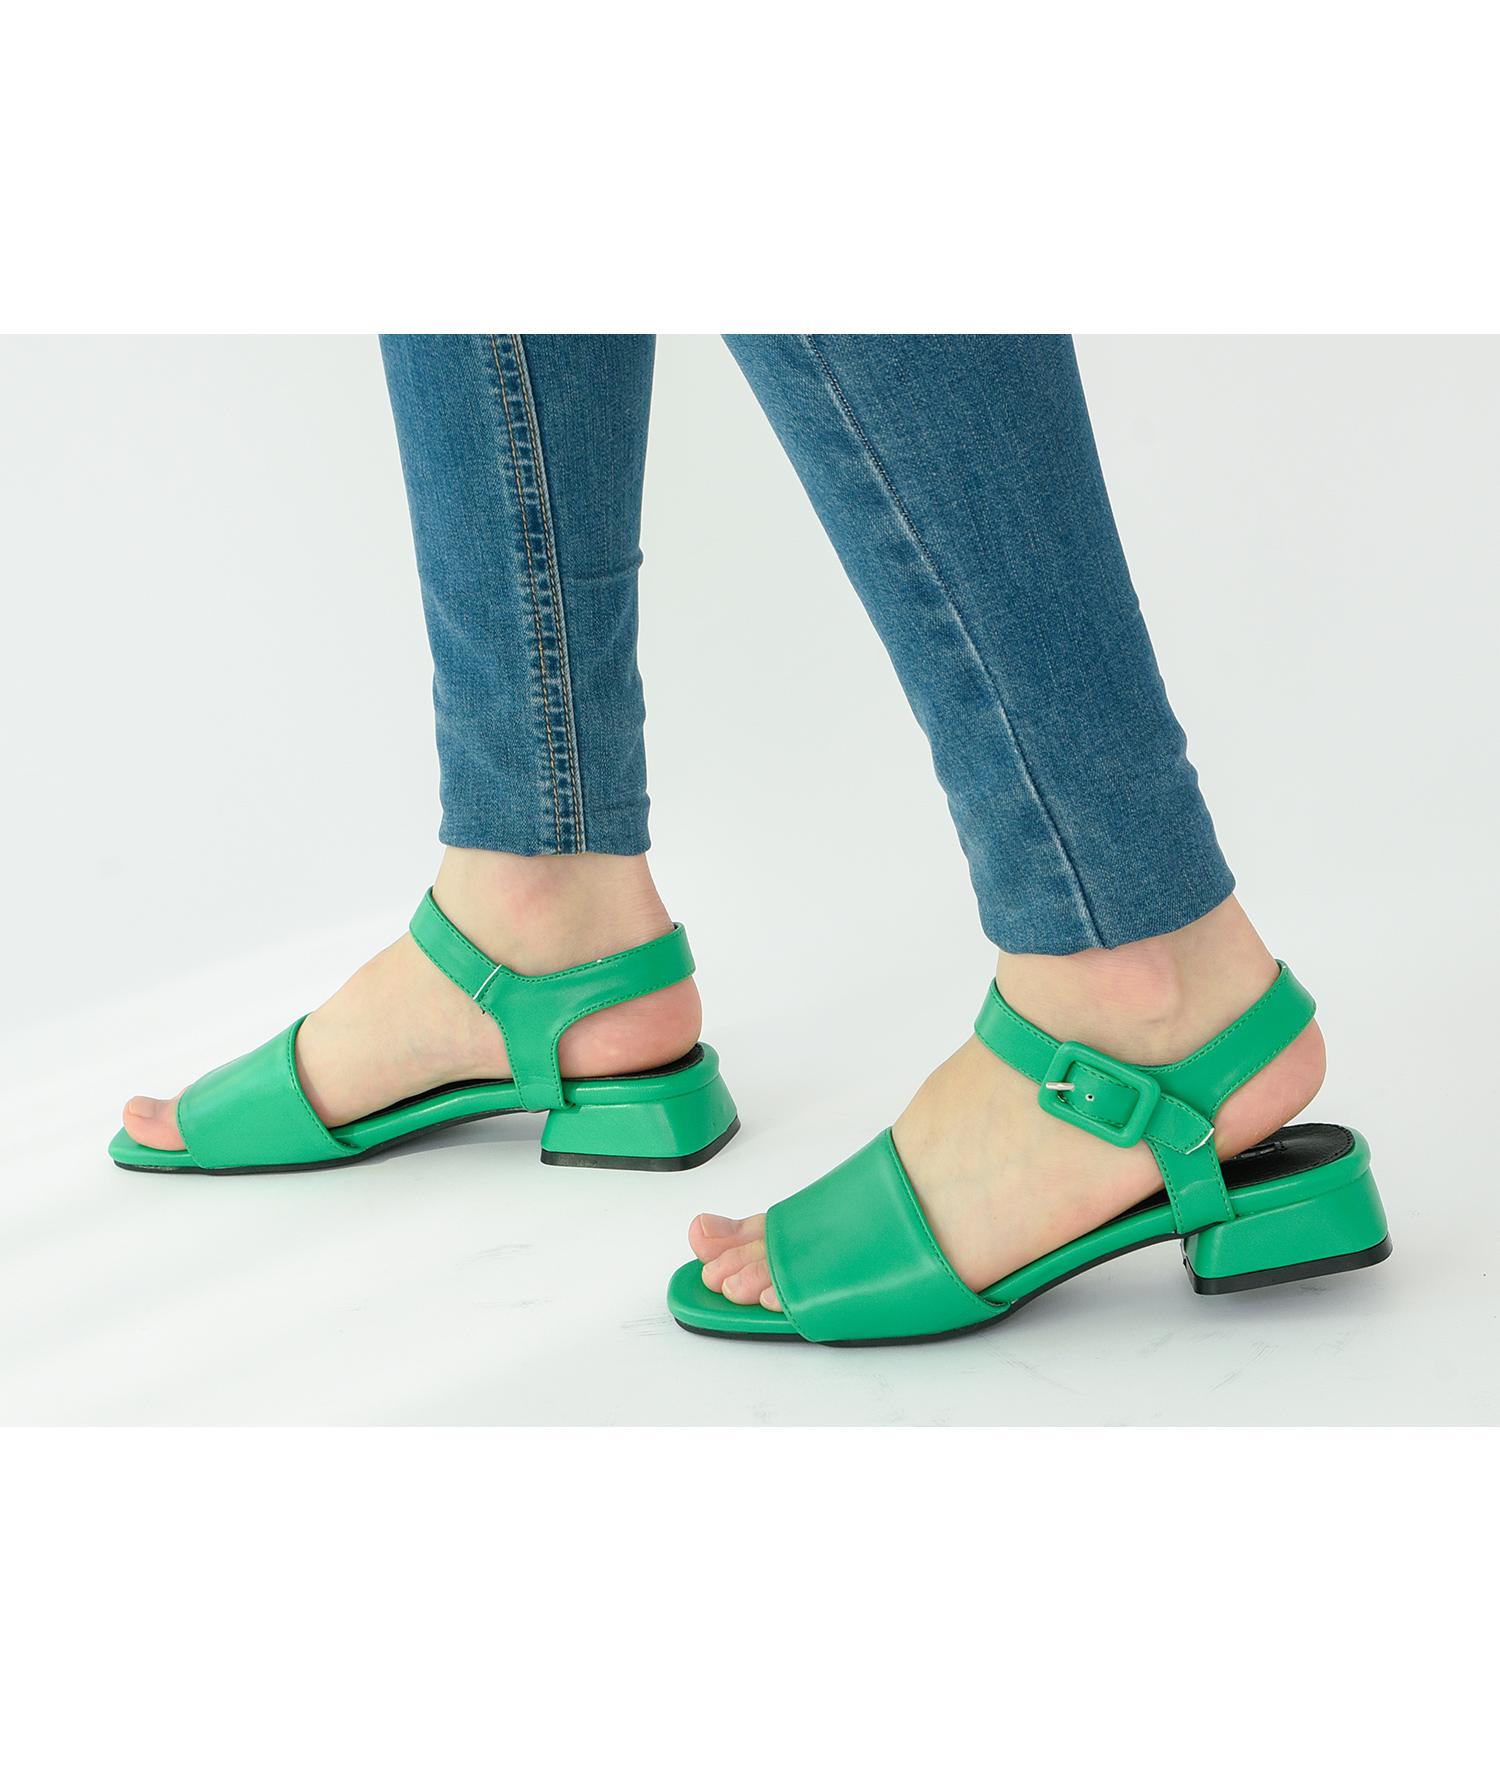 85ee581289c AnnaKastle Womens Vegan Leather Single Strap Sandals Green